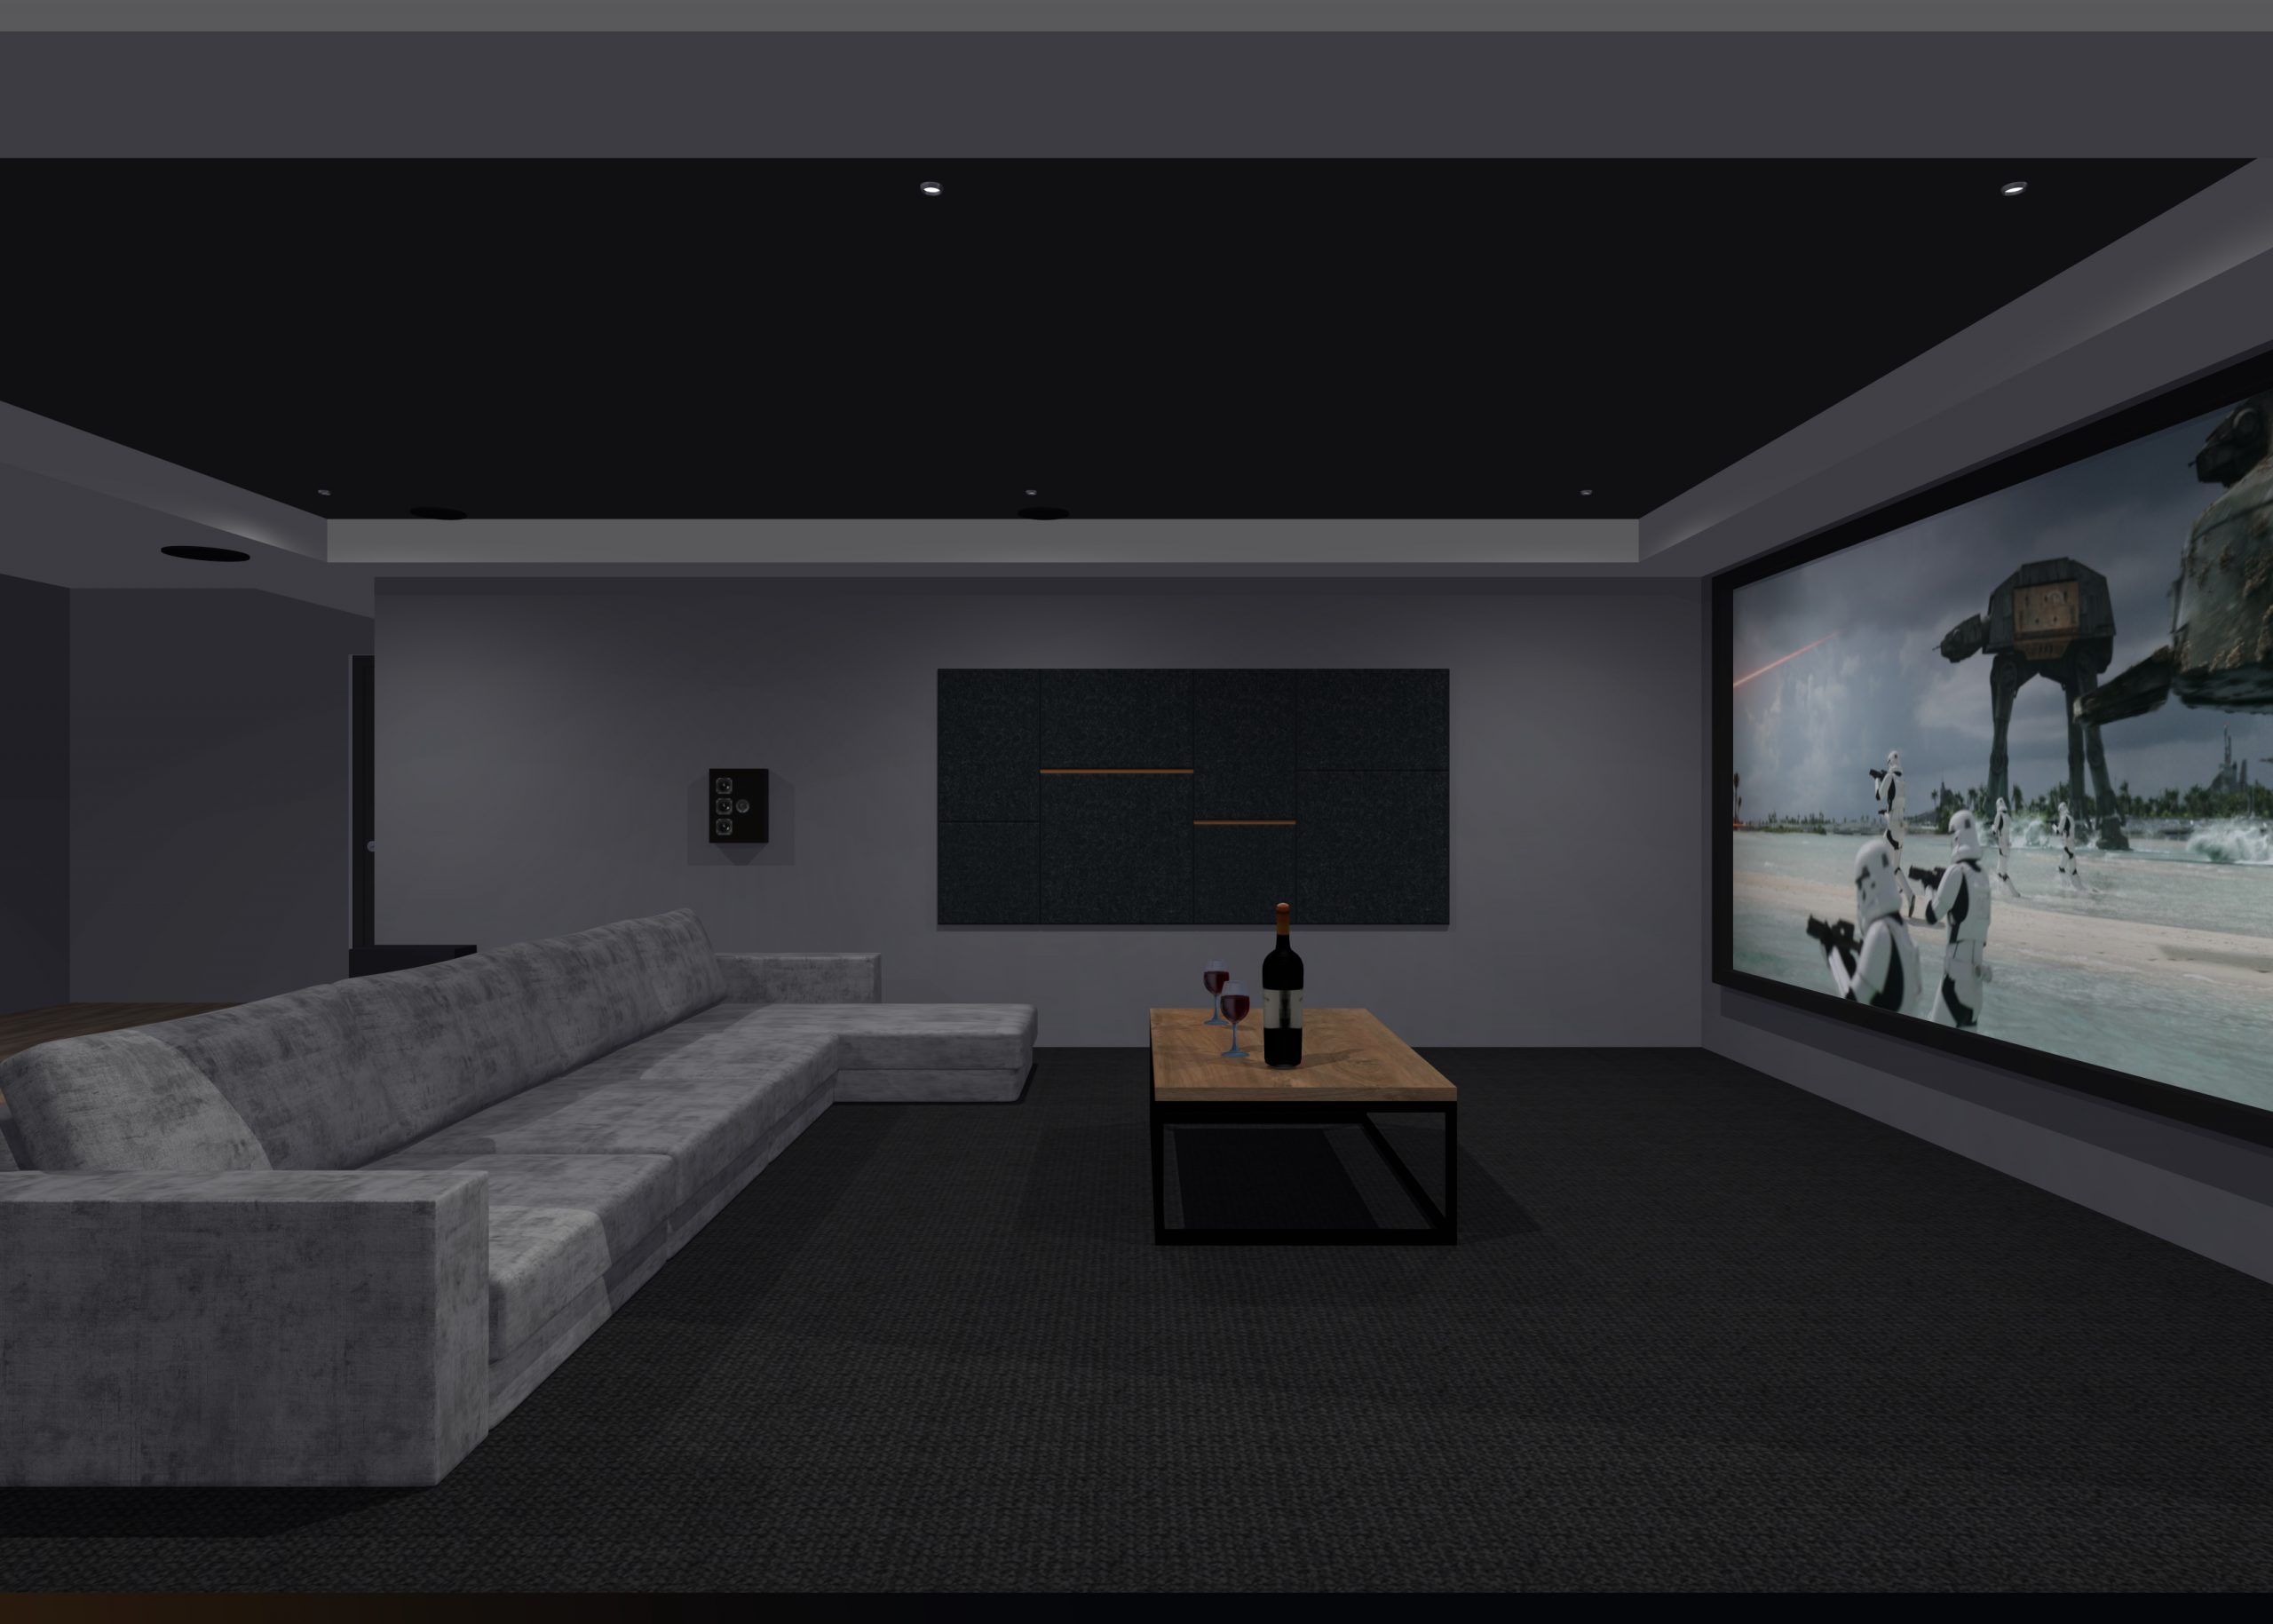 Current project - Garage conversion cinema